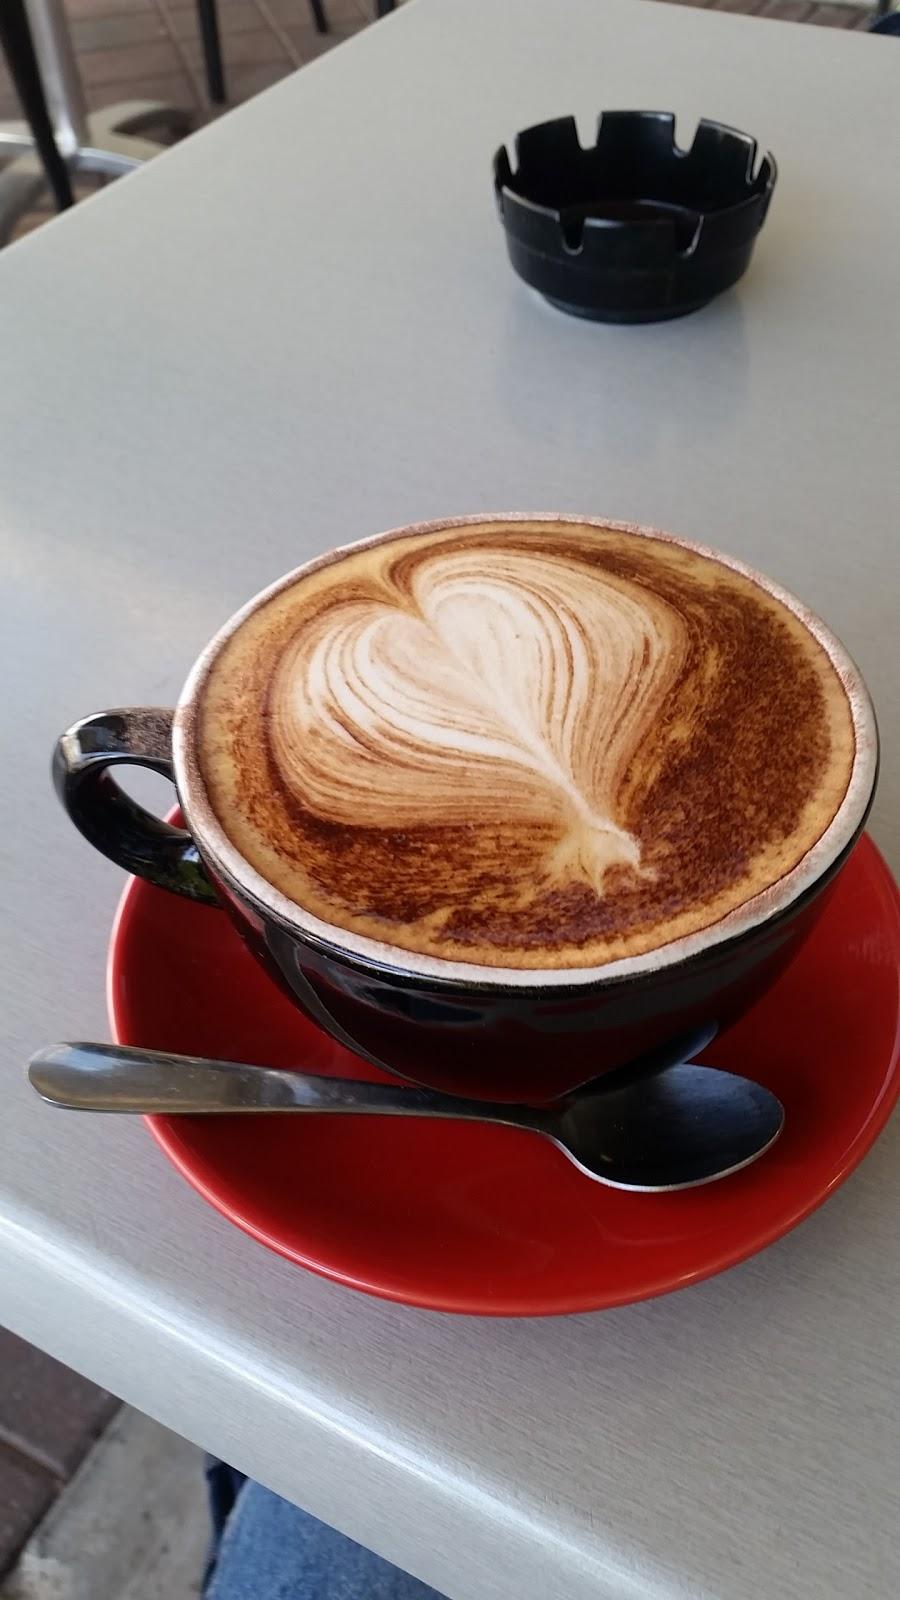 The Cross Snack Bar | cafe | 20 White Rd, Gepps Cross SA 5094, Australia | 0882607746 OR +61 8 8260 7746